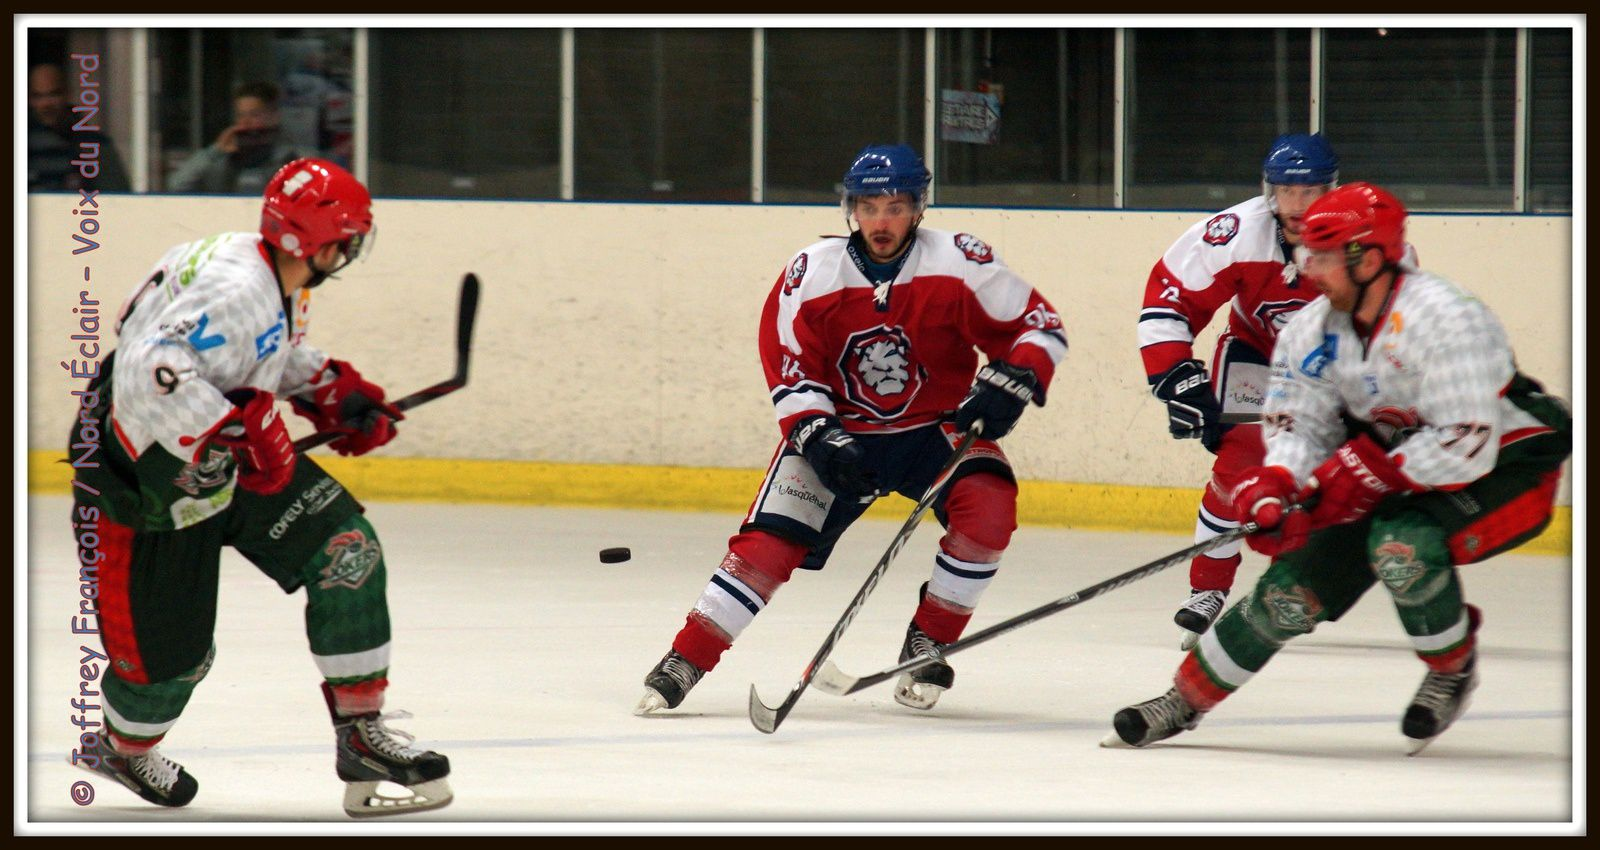 03.10.15 Hockey Lions-Cergy + TT Leers-Chalons